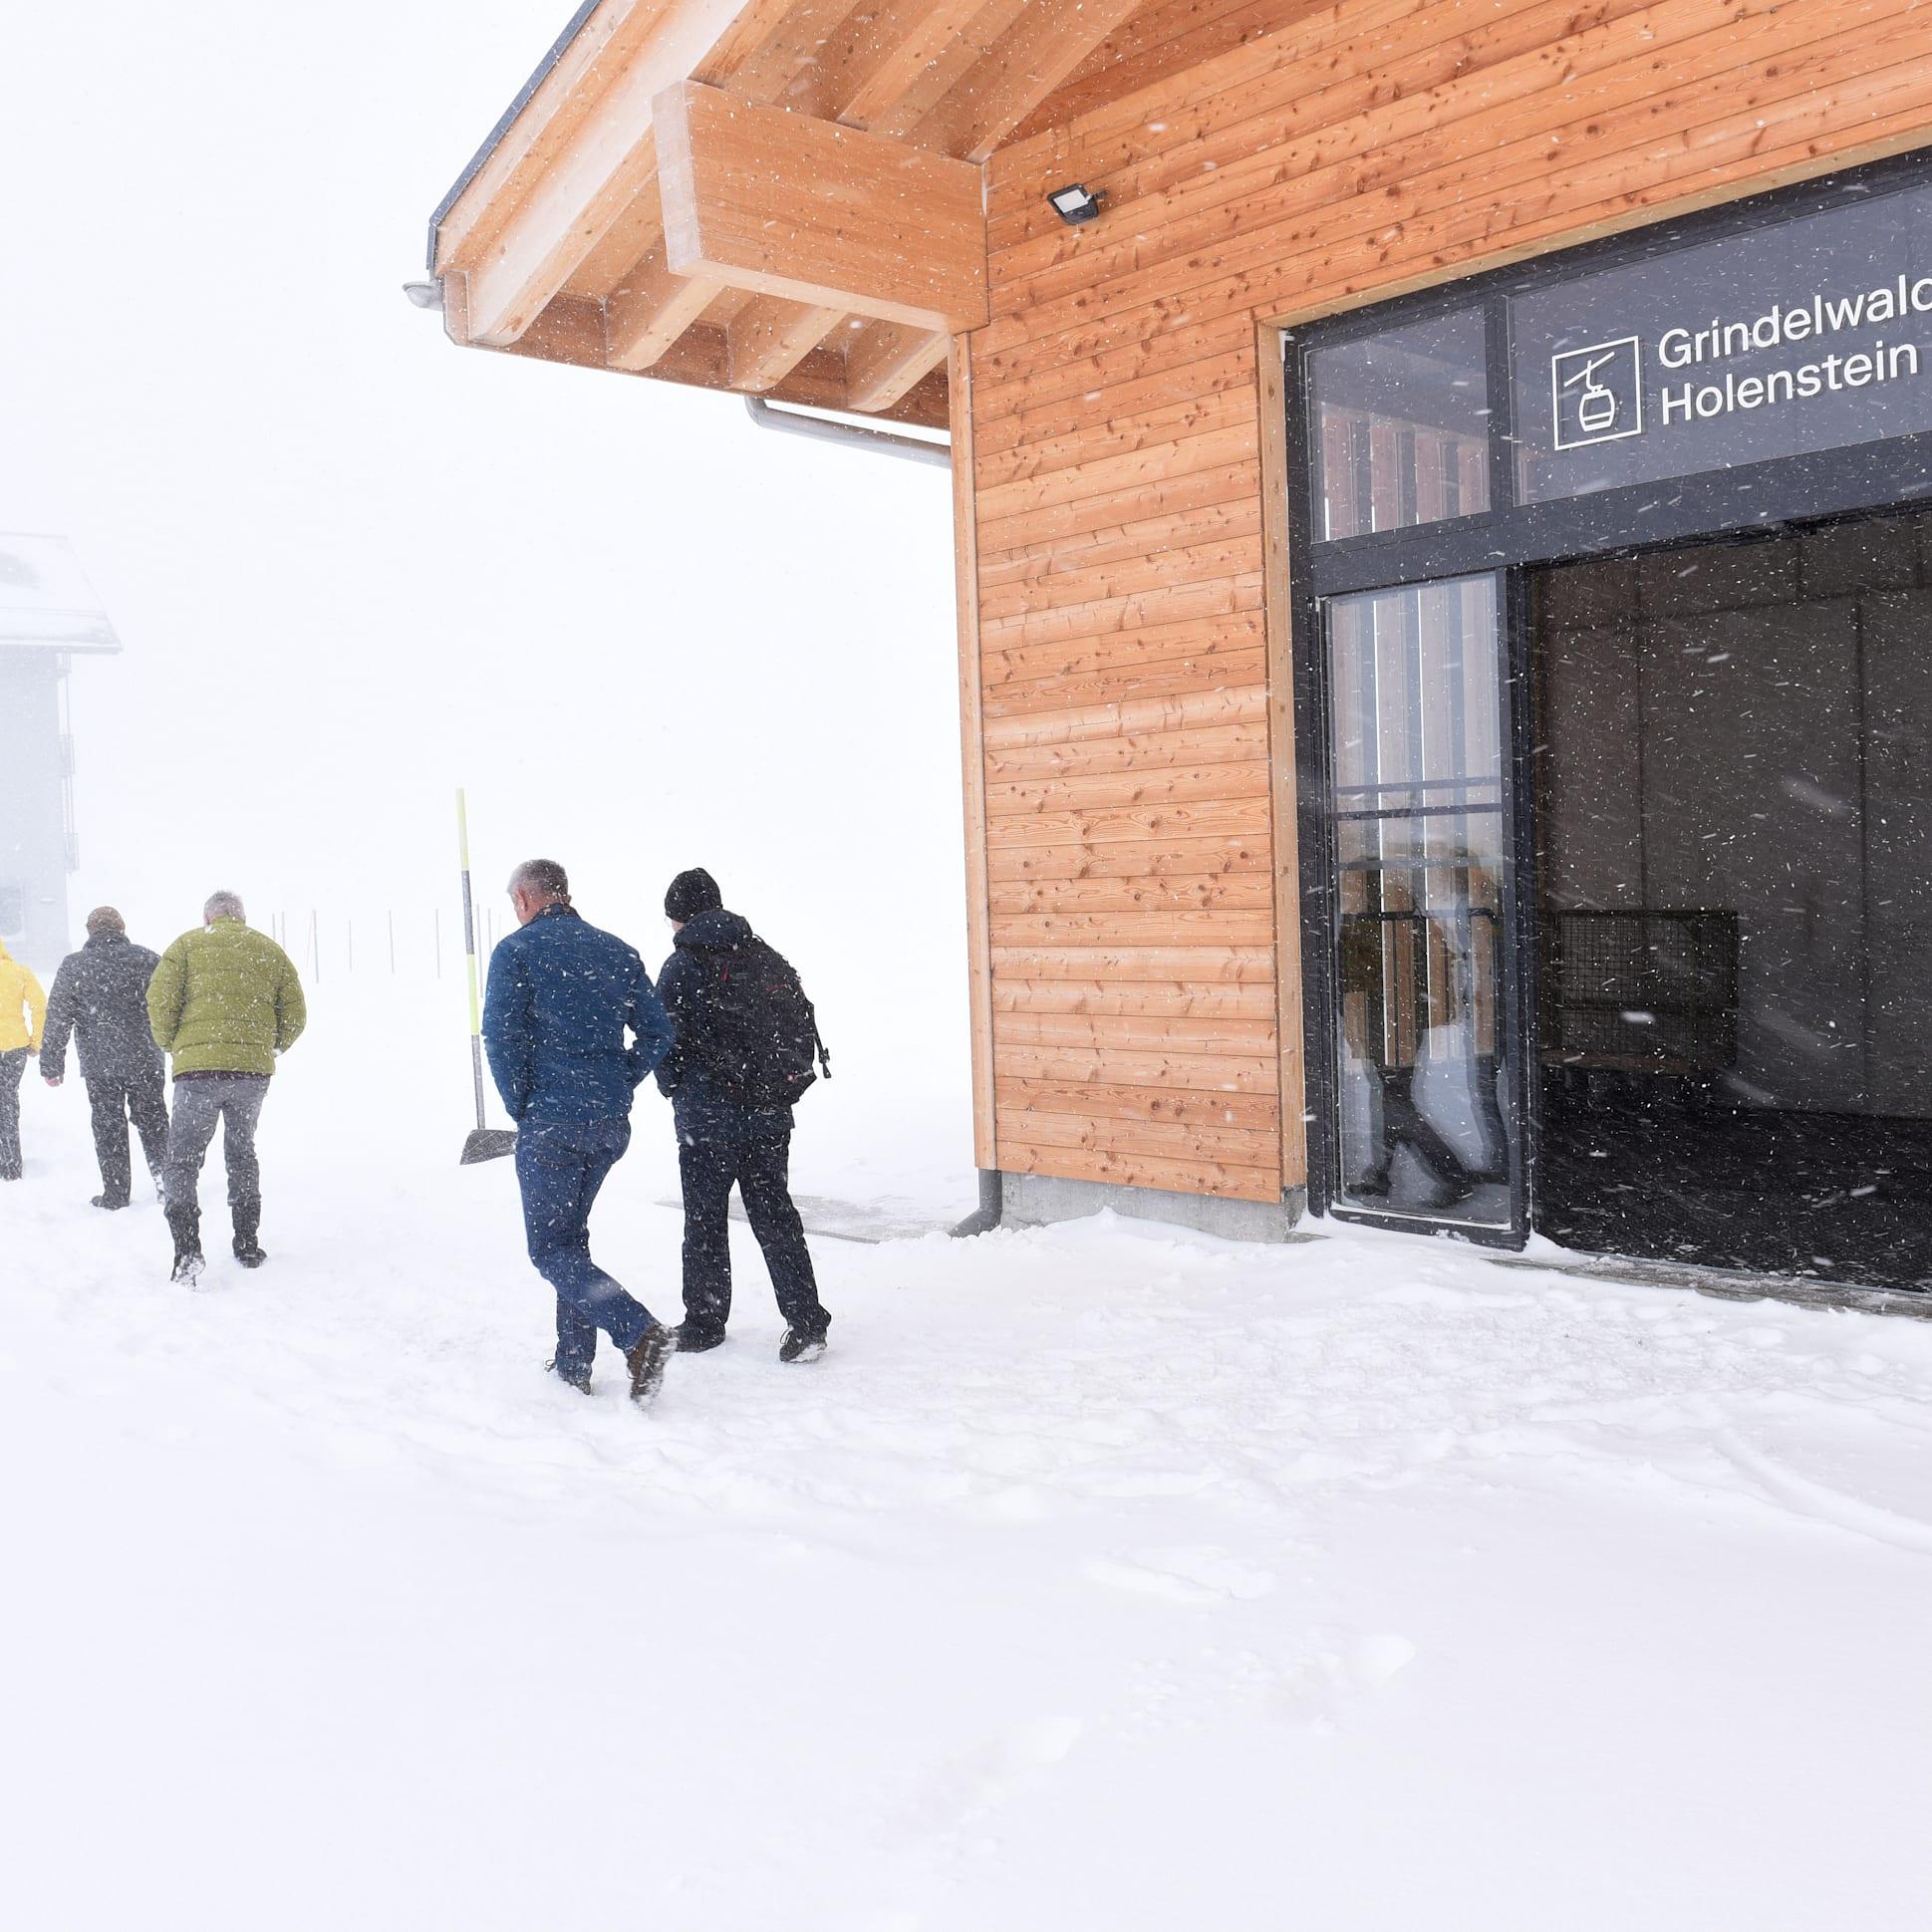 Opening GGM summit station Dec. 2019